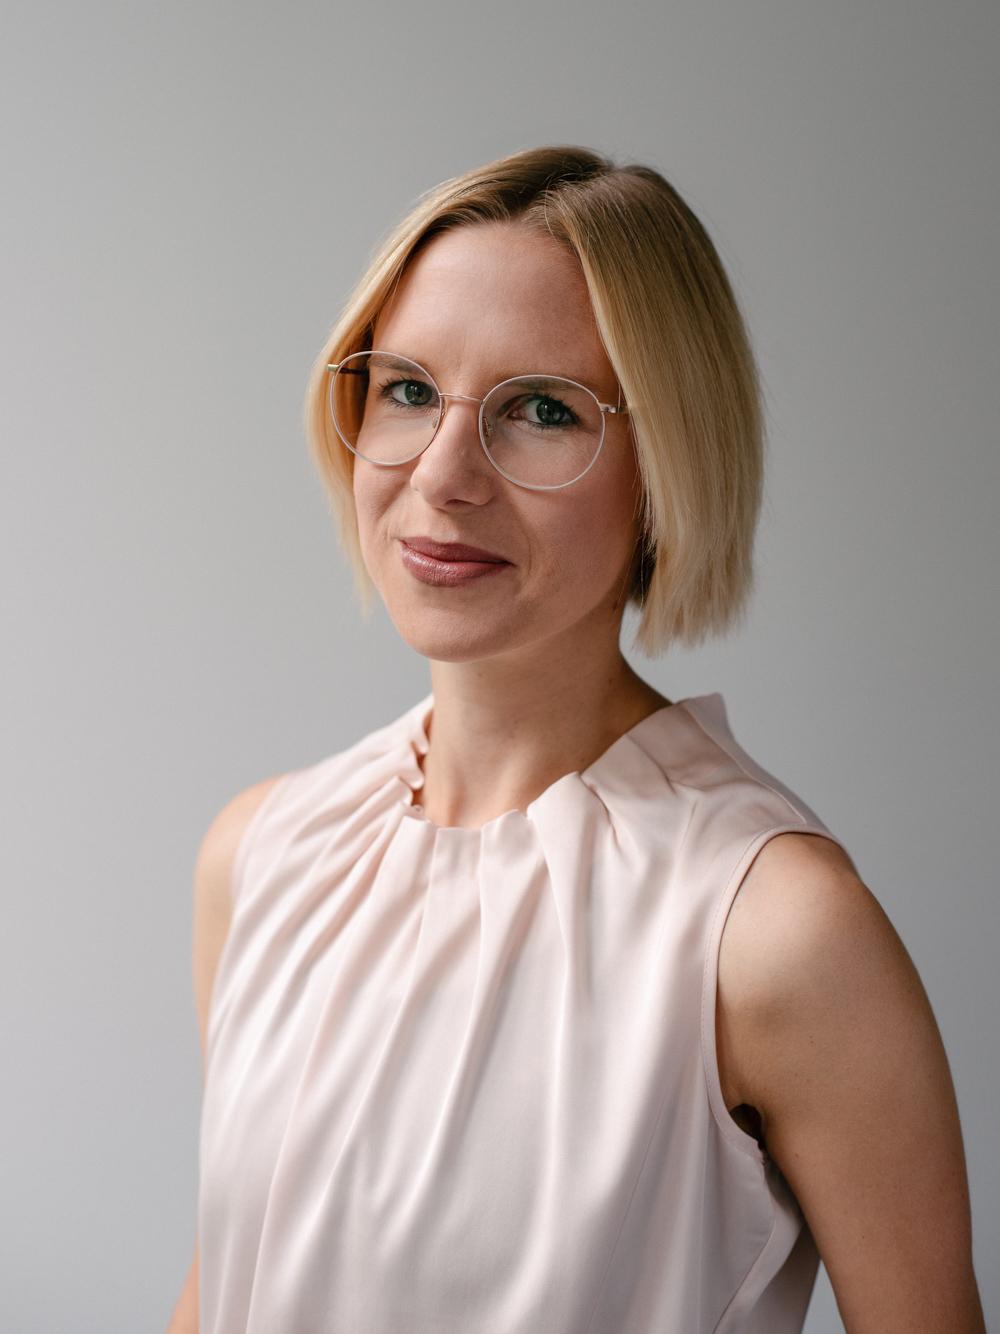 Jennifer Marek